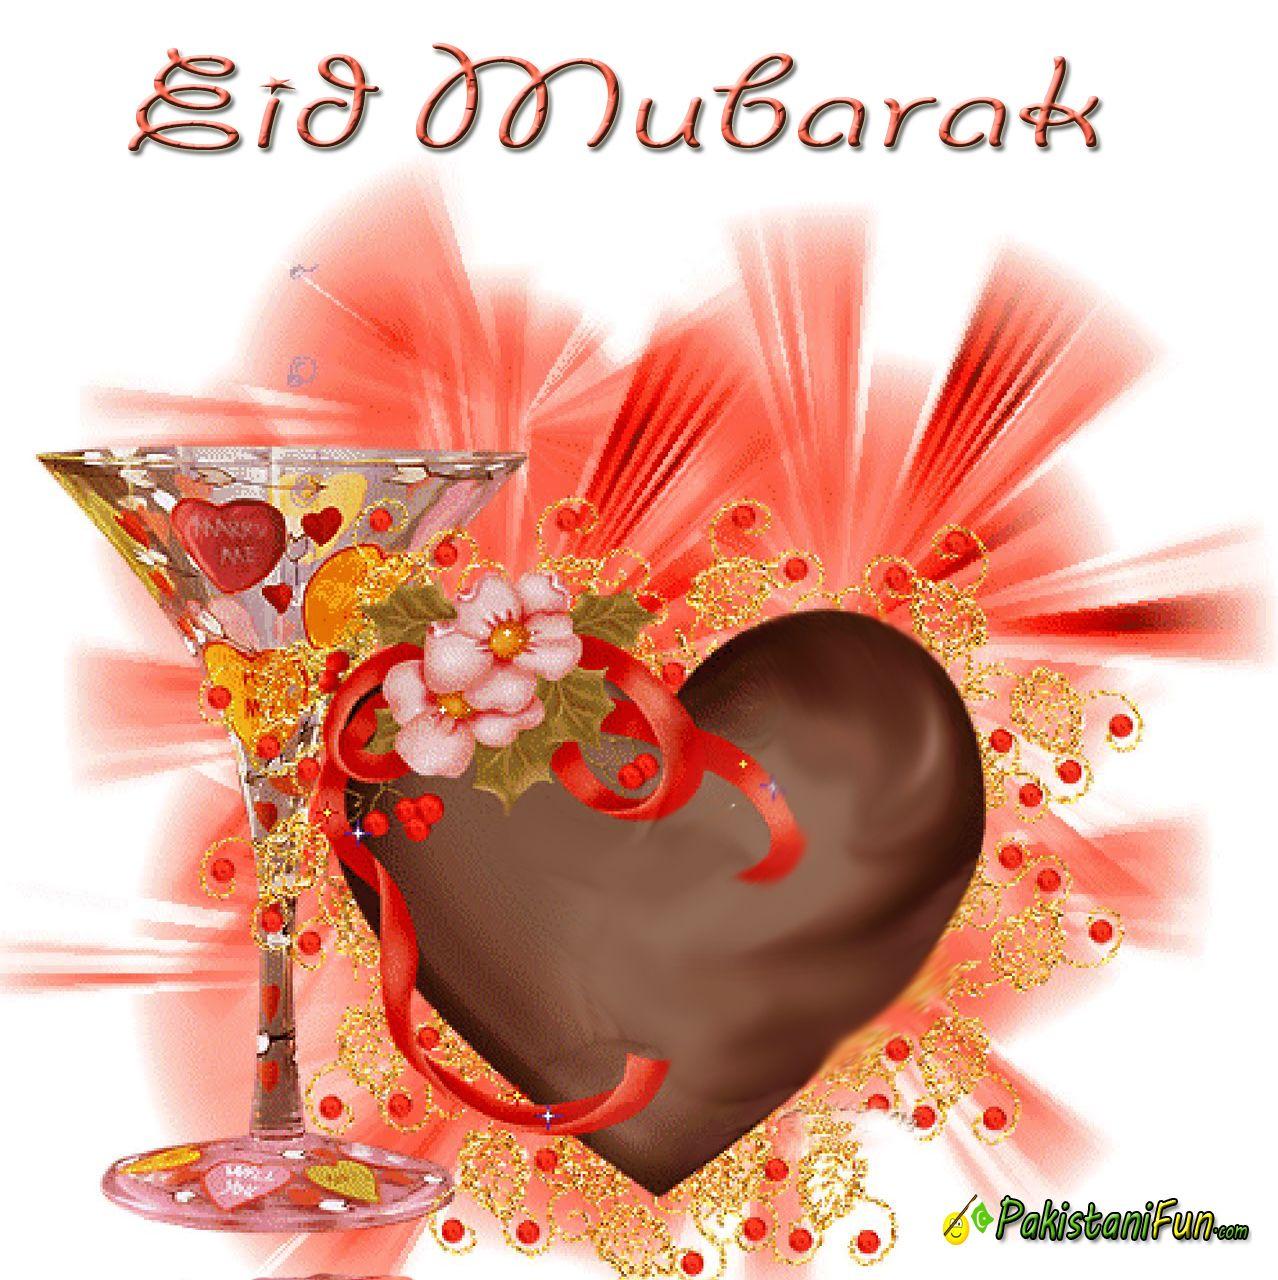 Hd wallpaper eid mubarak - Eid Mubarak Cute Pink Orange Colour Hd Wallpaper Eid Card